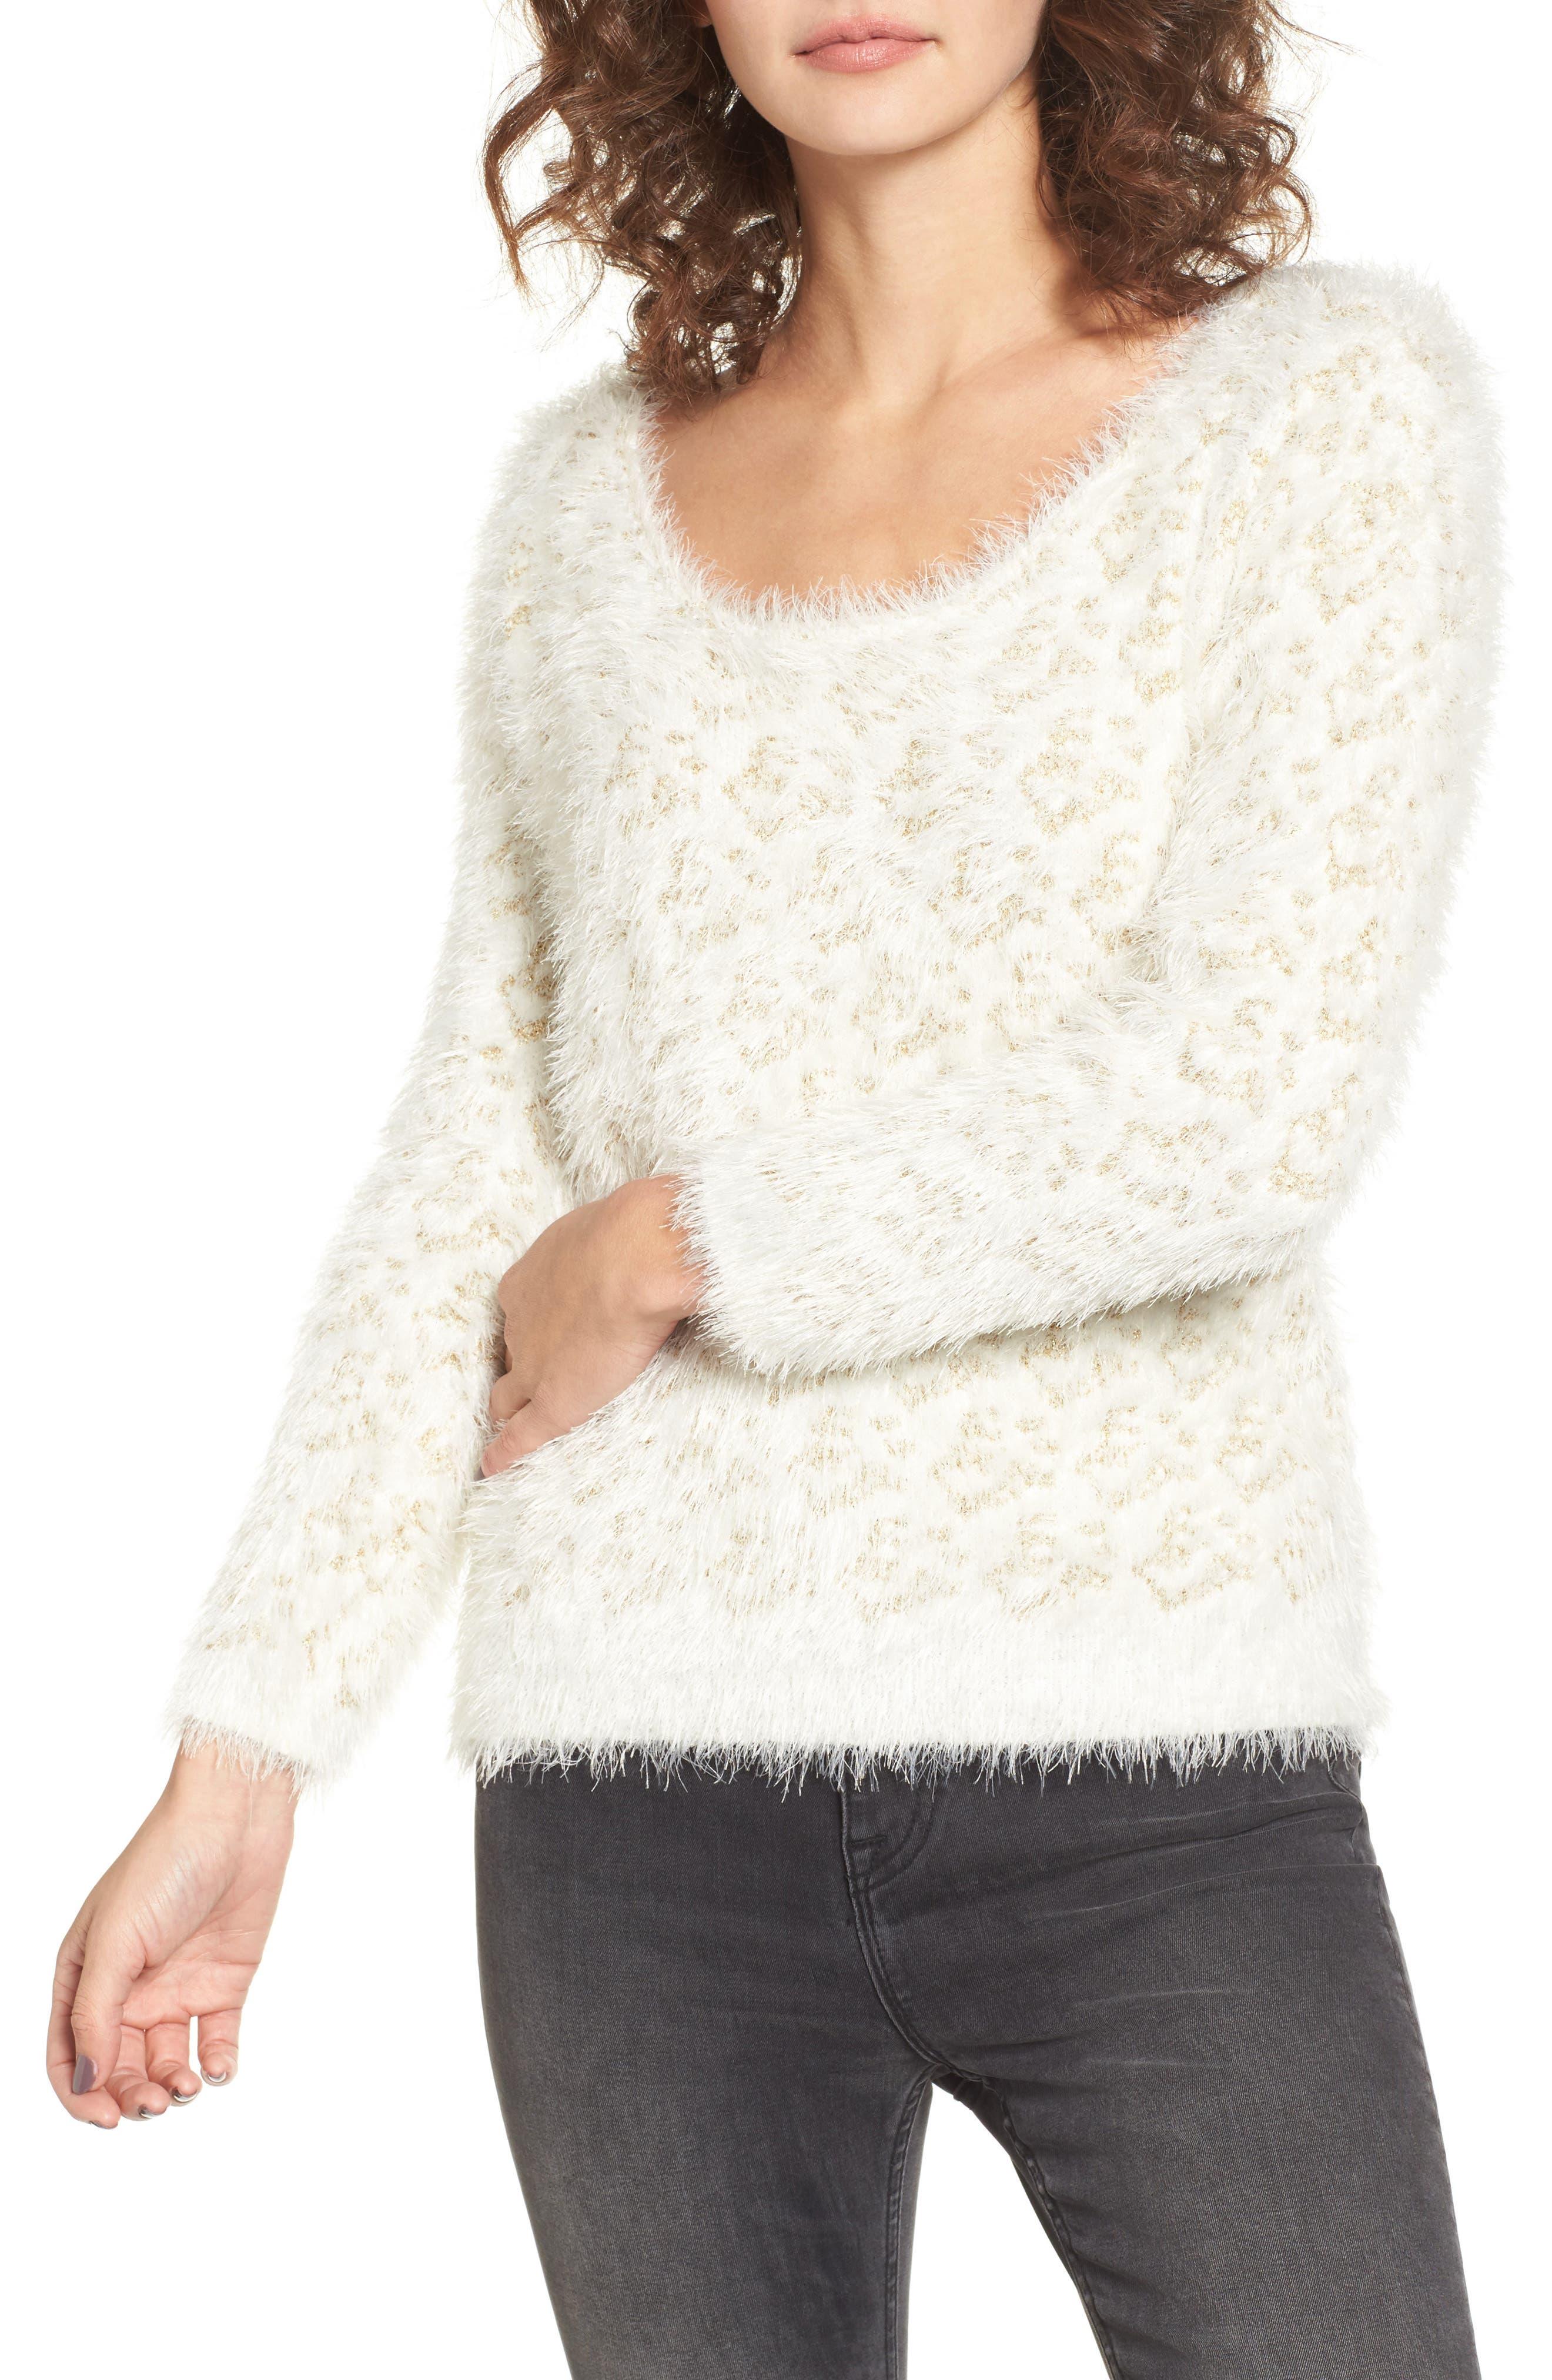 Cassidy Fuzzy Eyelash Sweater,                         Main,                         color, 710